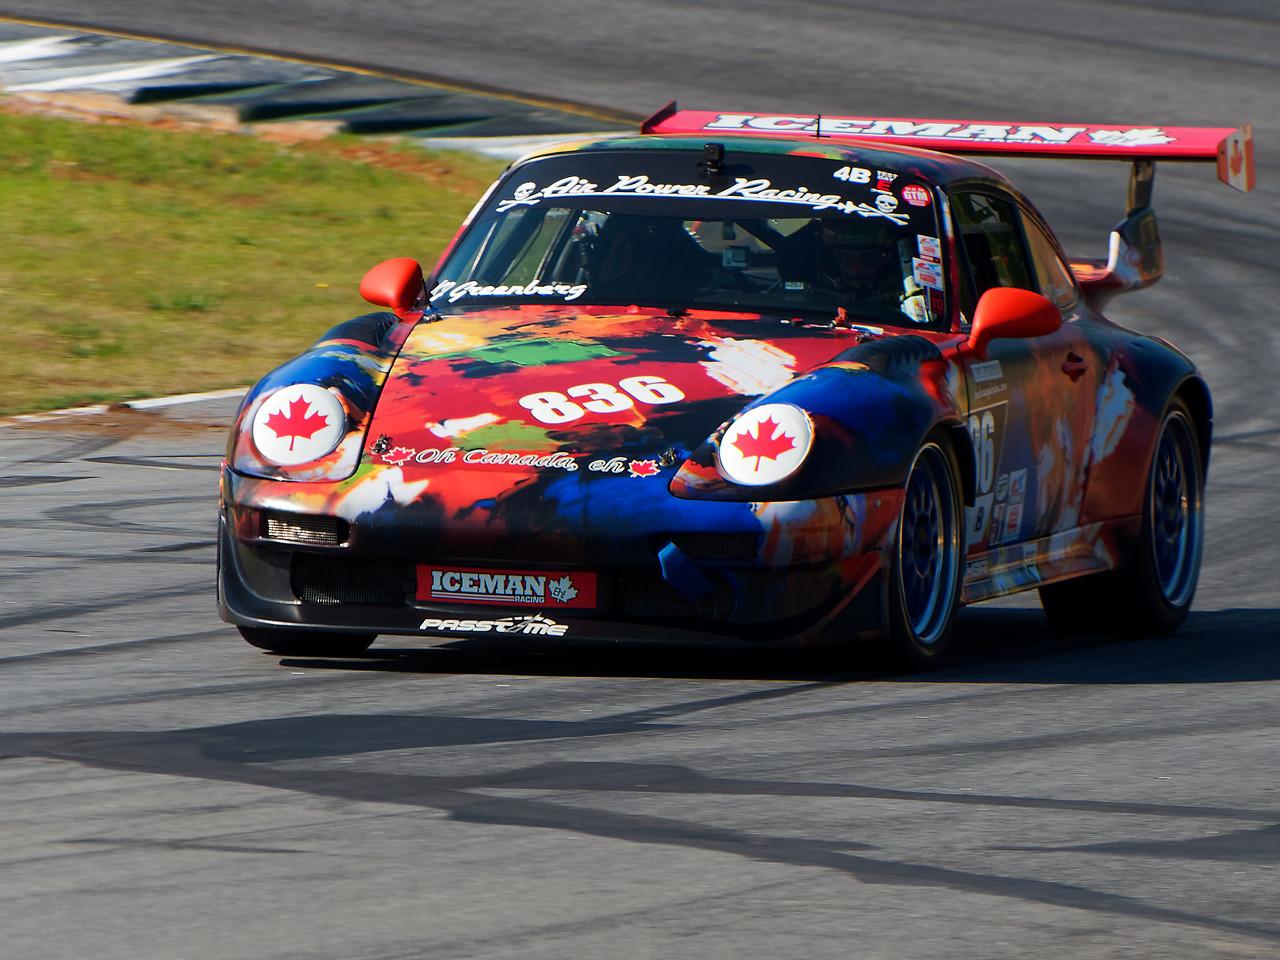 Beautiful Porsche flying Canadian Maple Leafs